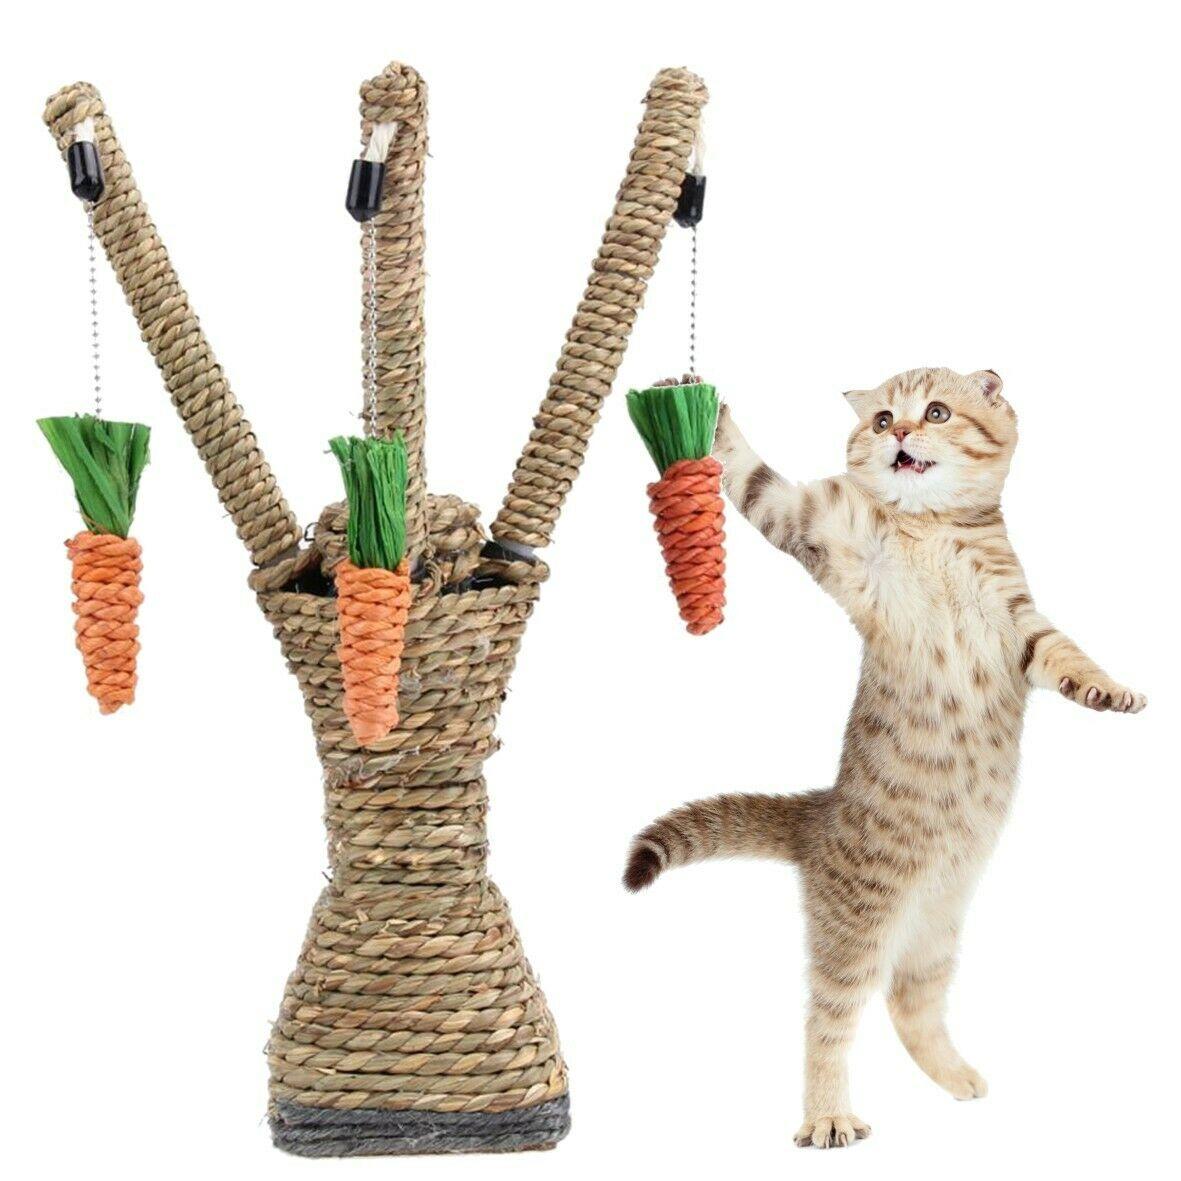 Gato árbol de escalada de juguetes para gatos interactivo paja Natural cuerda de Sisal rascado de gato pequeño puesto de juguete con zanahorias